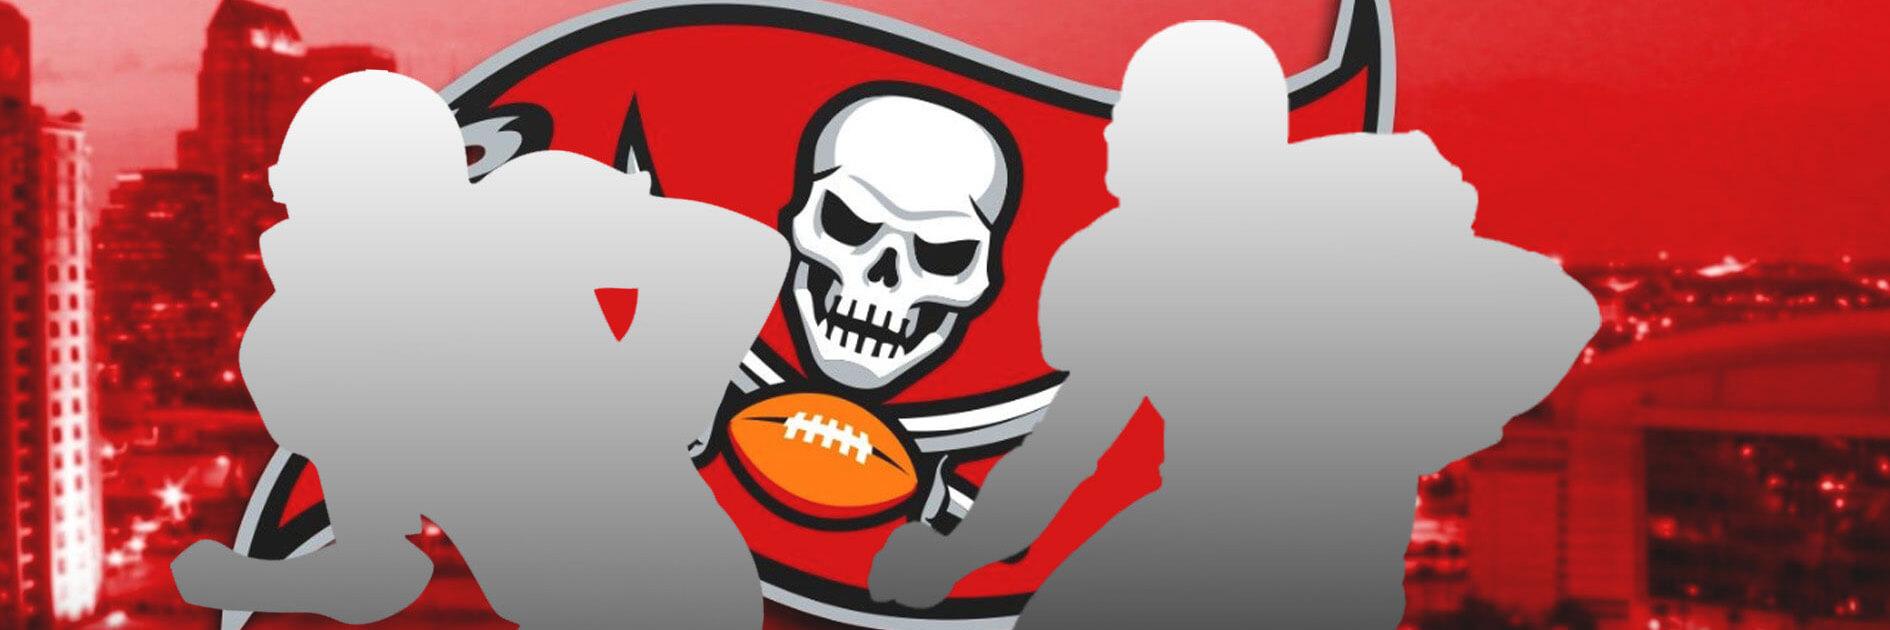 NFC SouthMock Draft For 2020 Draft